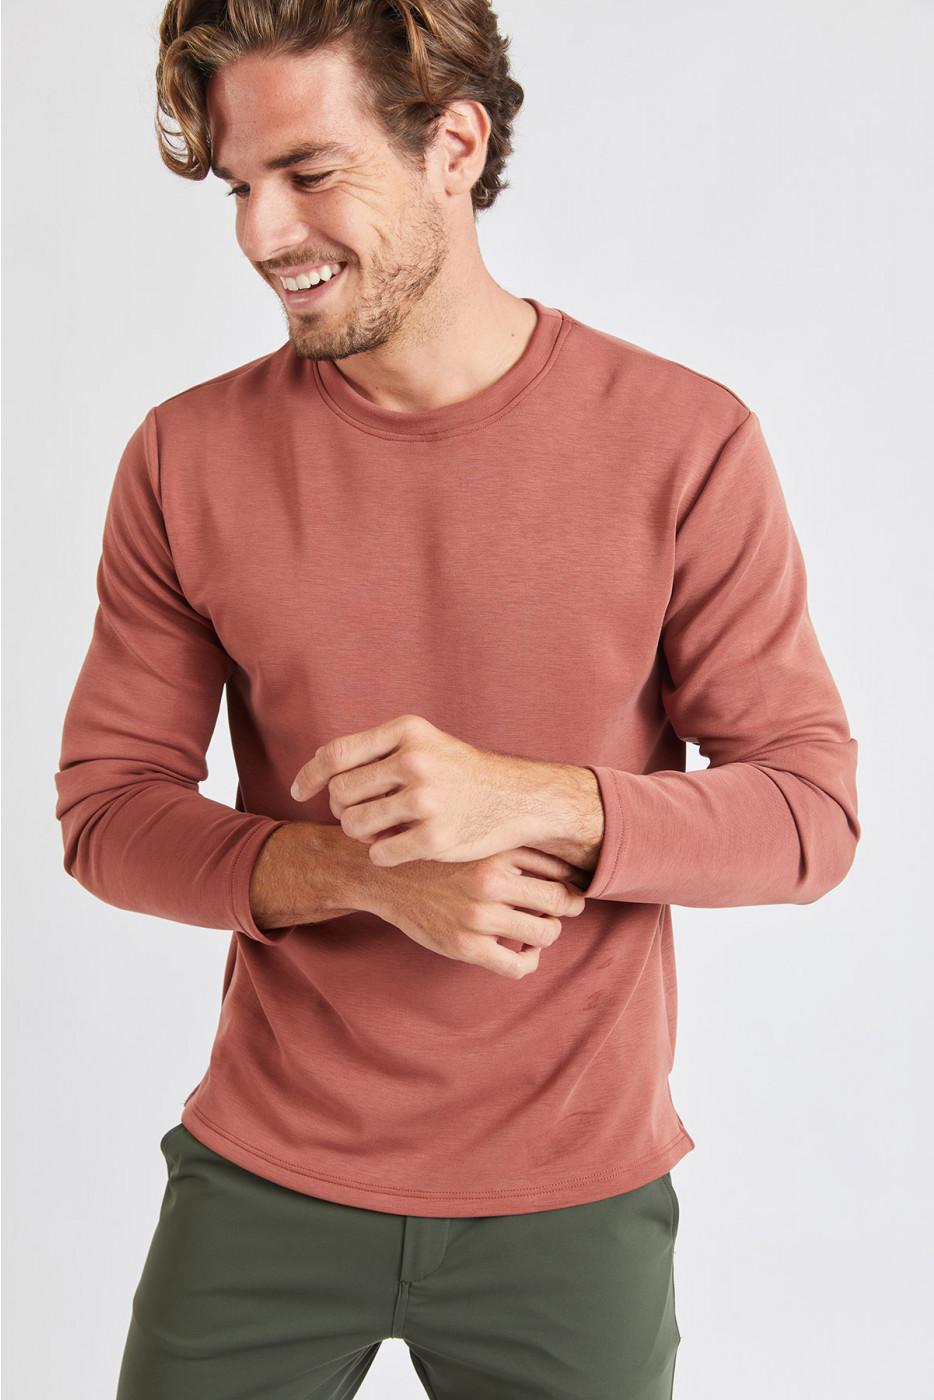 Tshirt marron GINO ALASSIO